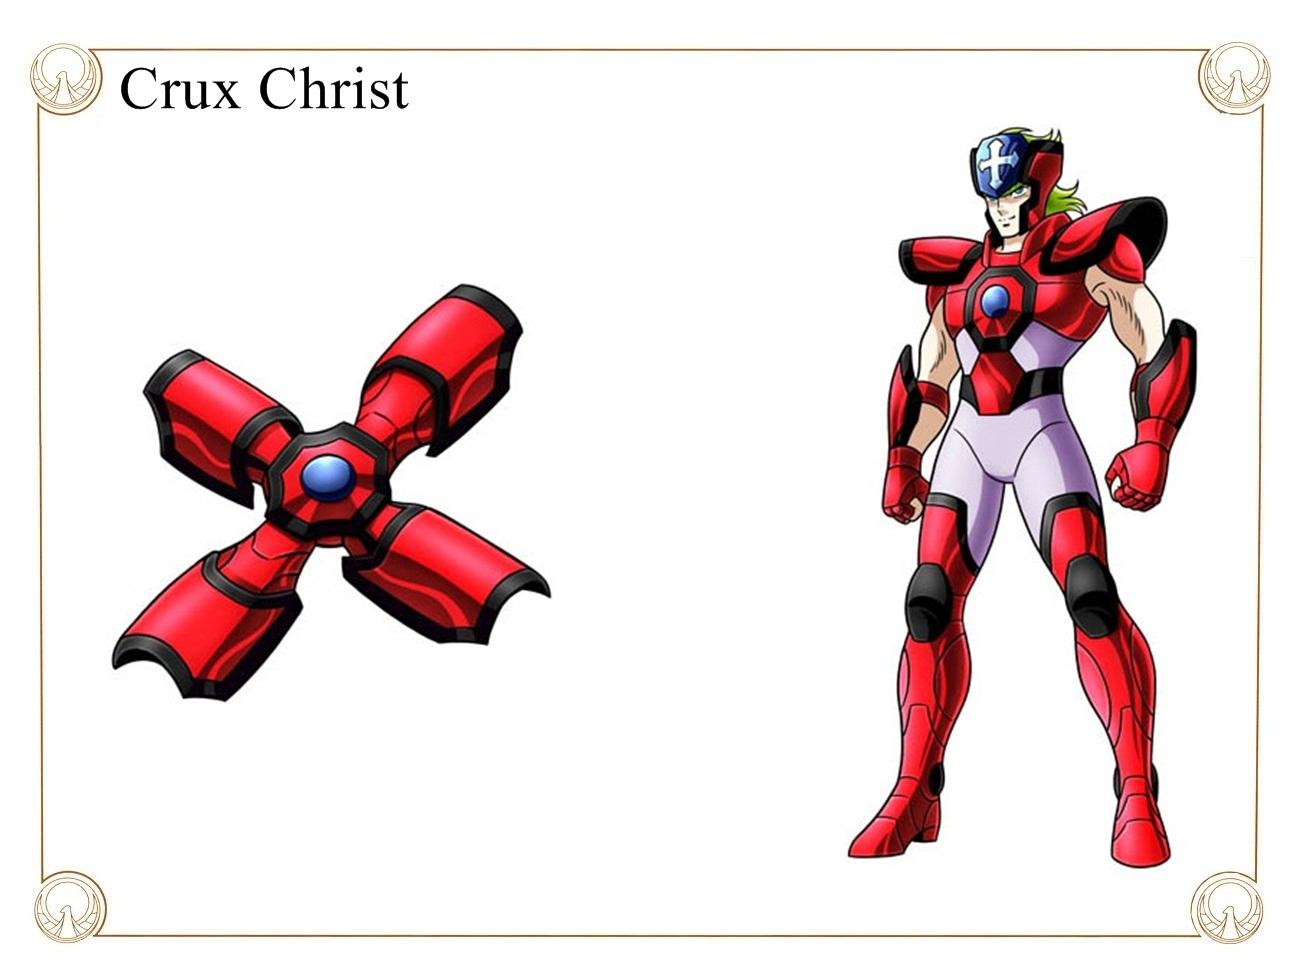 crux_christ_by_javiiit0-d4p627p.jpg